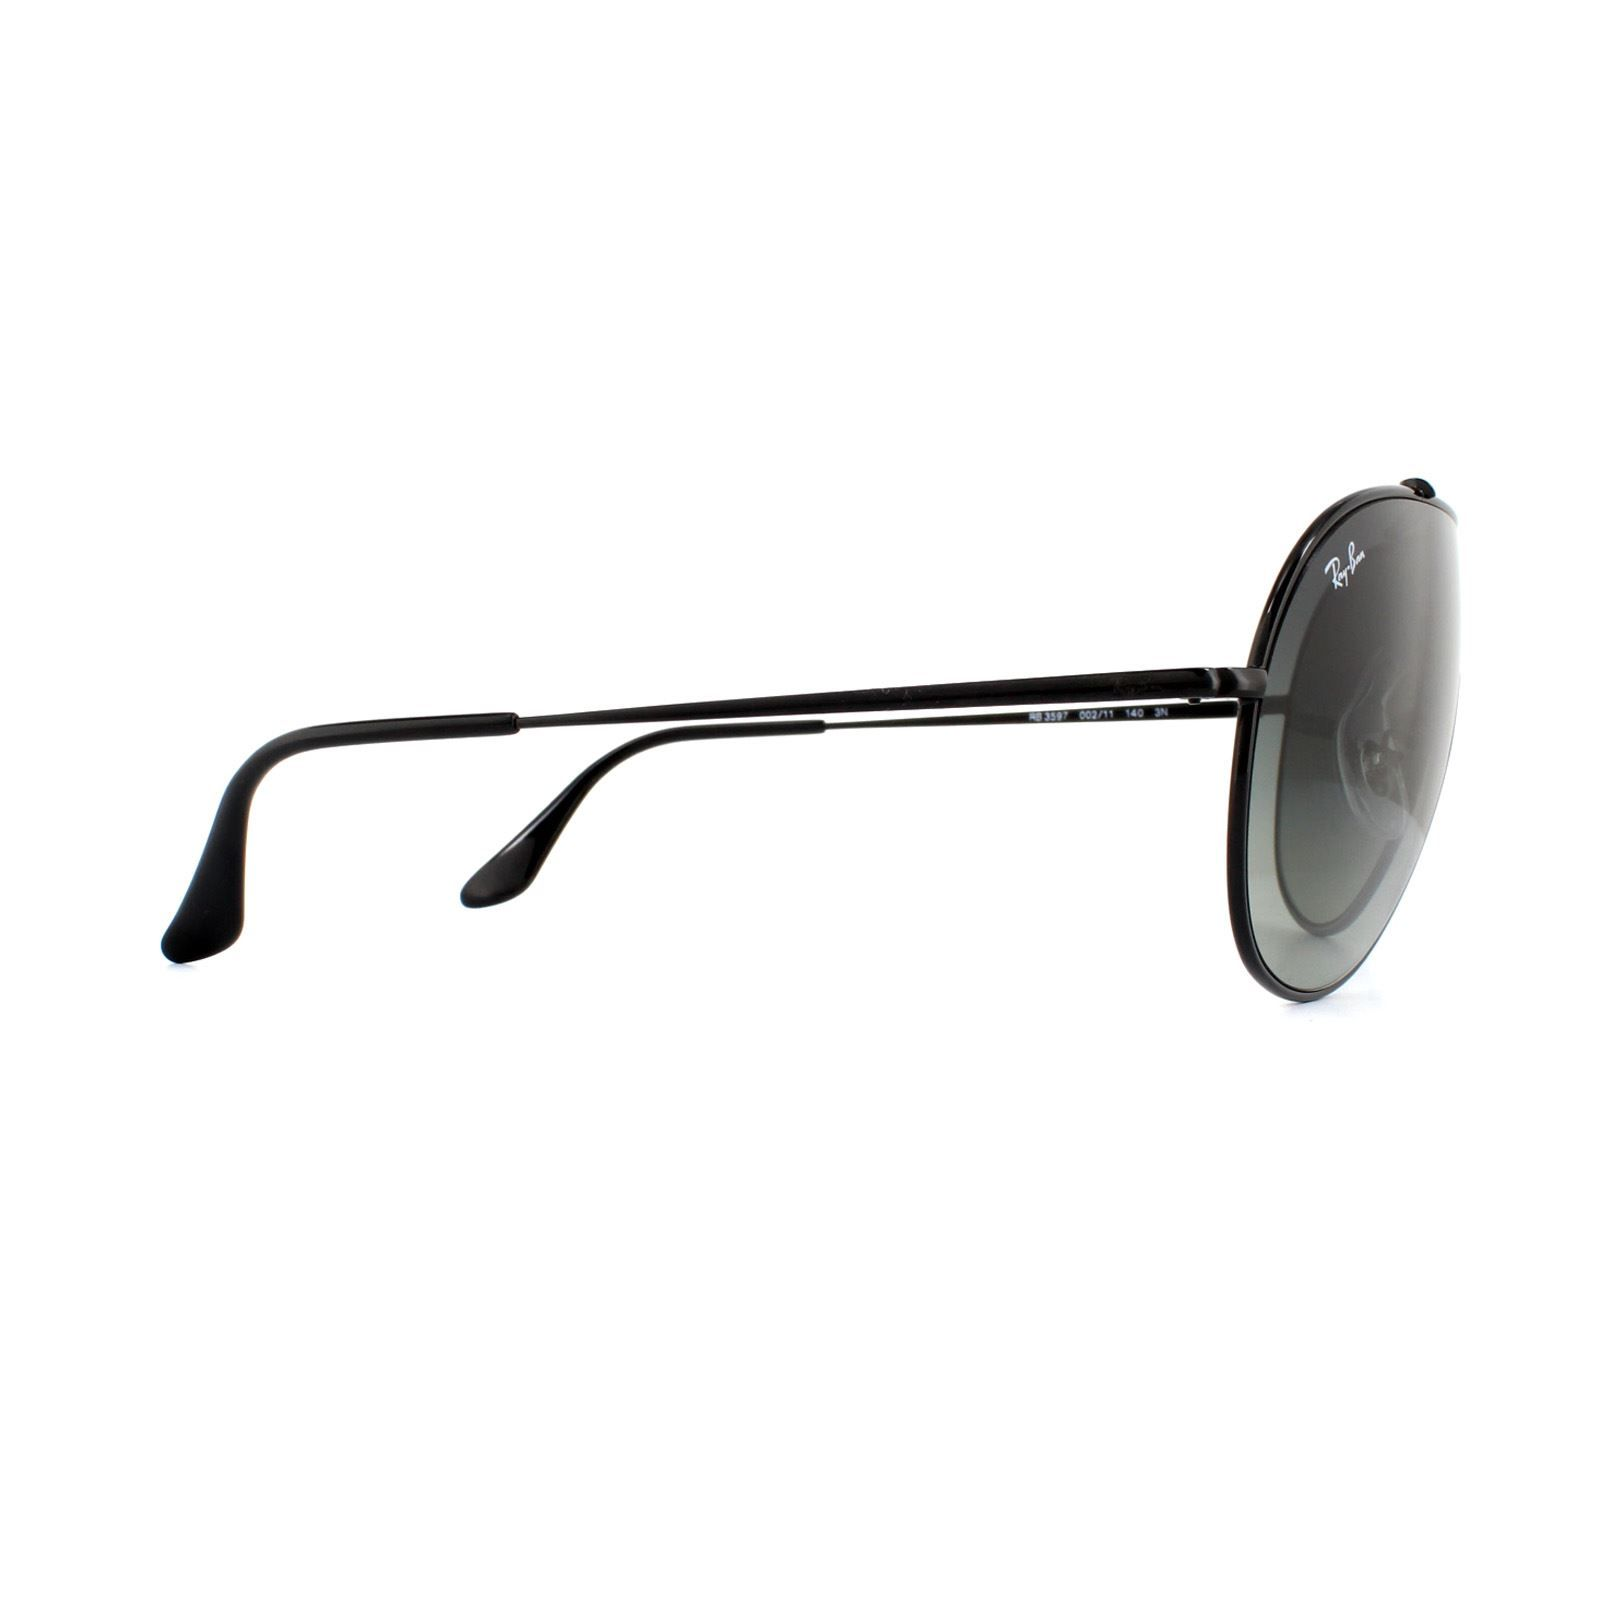 Ray-Ban Sunglasses Wings RB3597 002/11 Black Grey Gradient